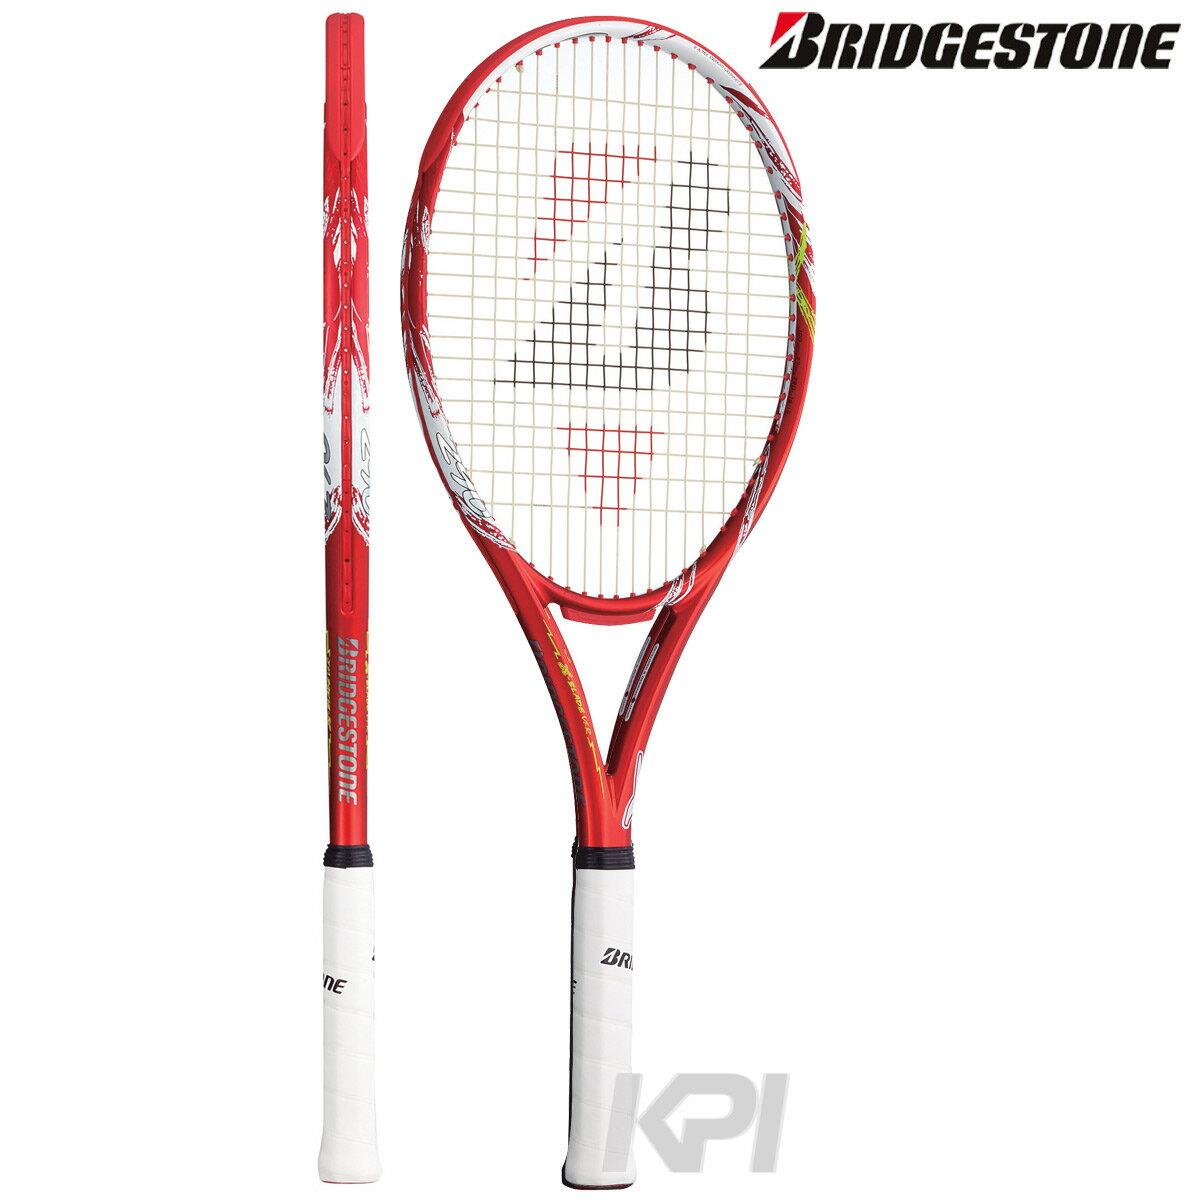 BRIDGESTONE(ブリヂストン)「X-BLADE VI-R290(エックスブレードブイアイR290) BRAV65」硬式テニスラケット【KPI】